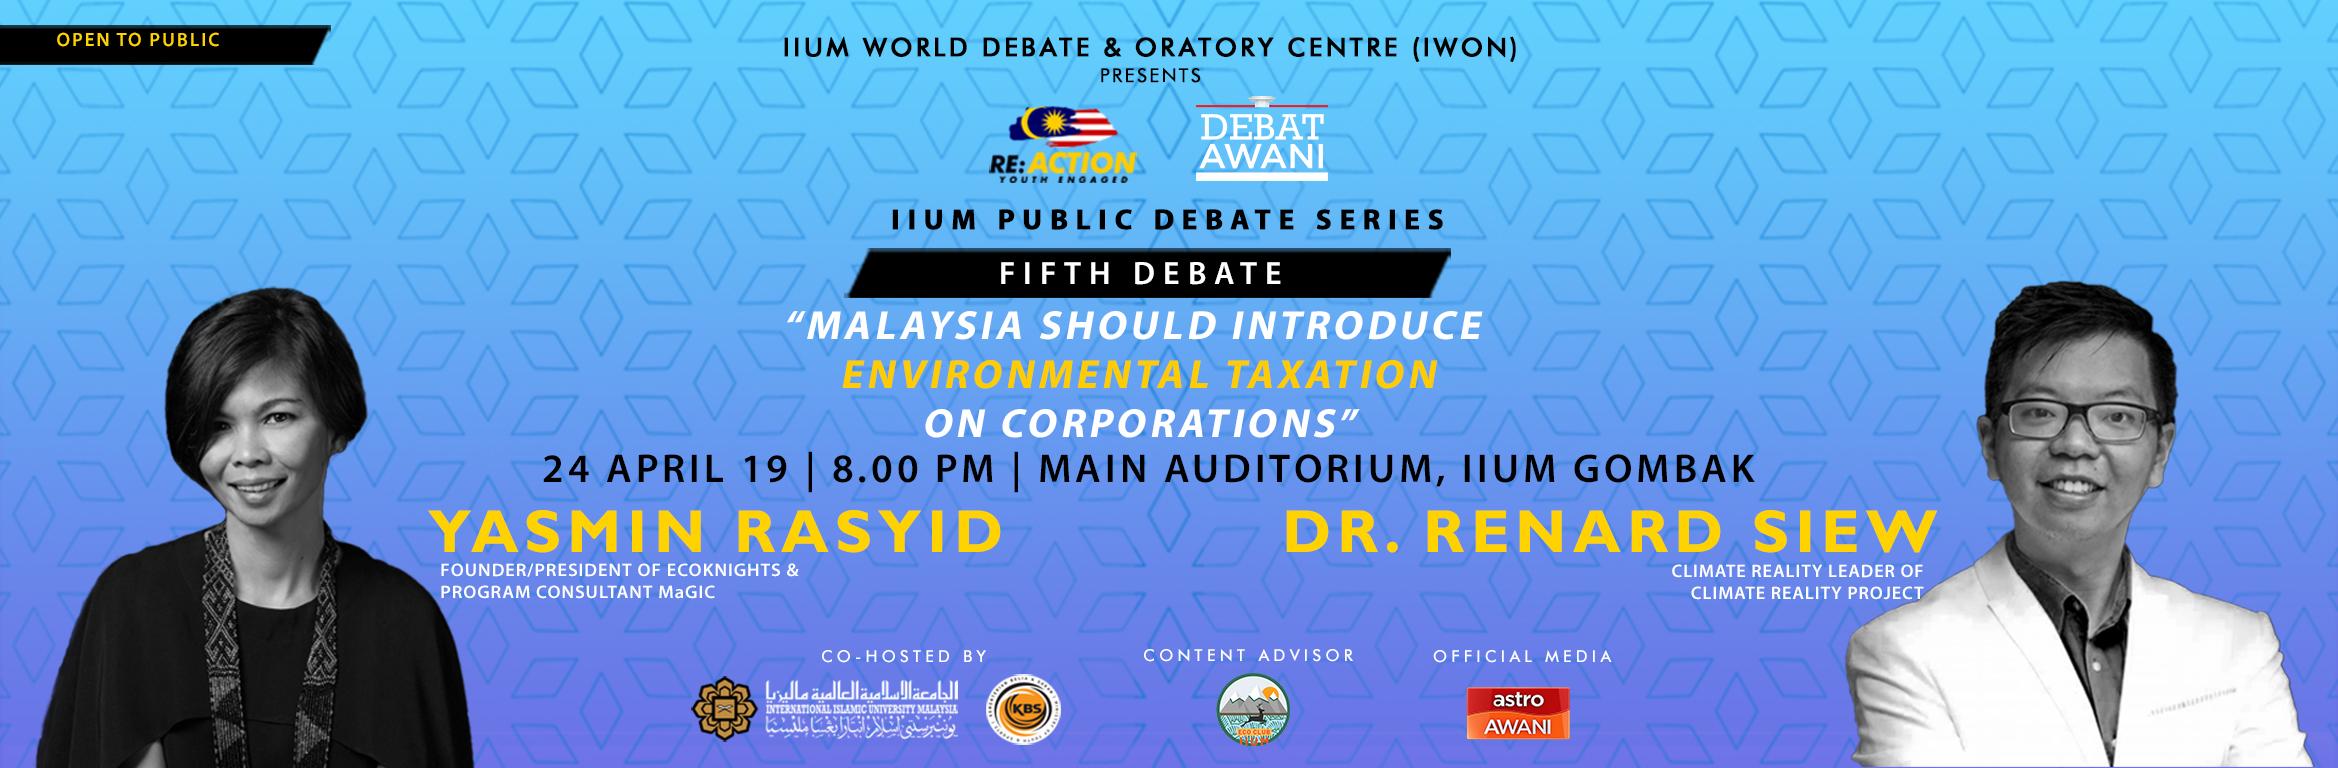 "IIUM Public Debate Series #5 : Malaysia Should Introduce Environmental Taxation on Corporations"""